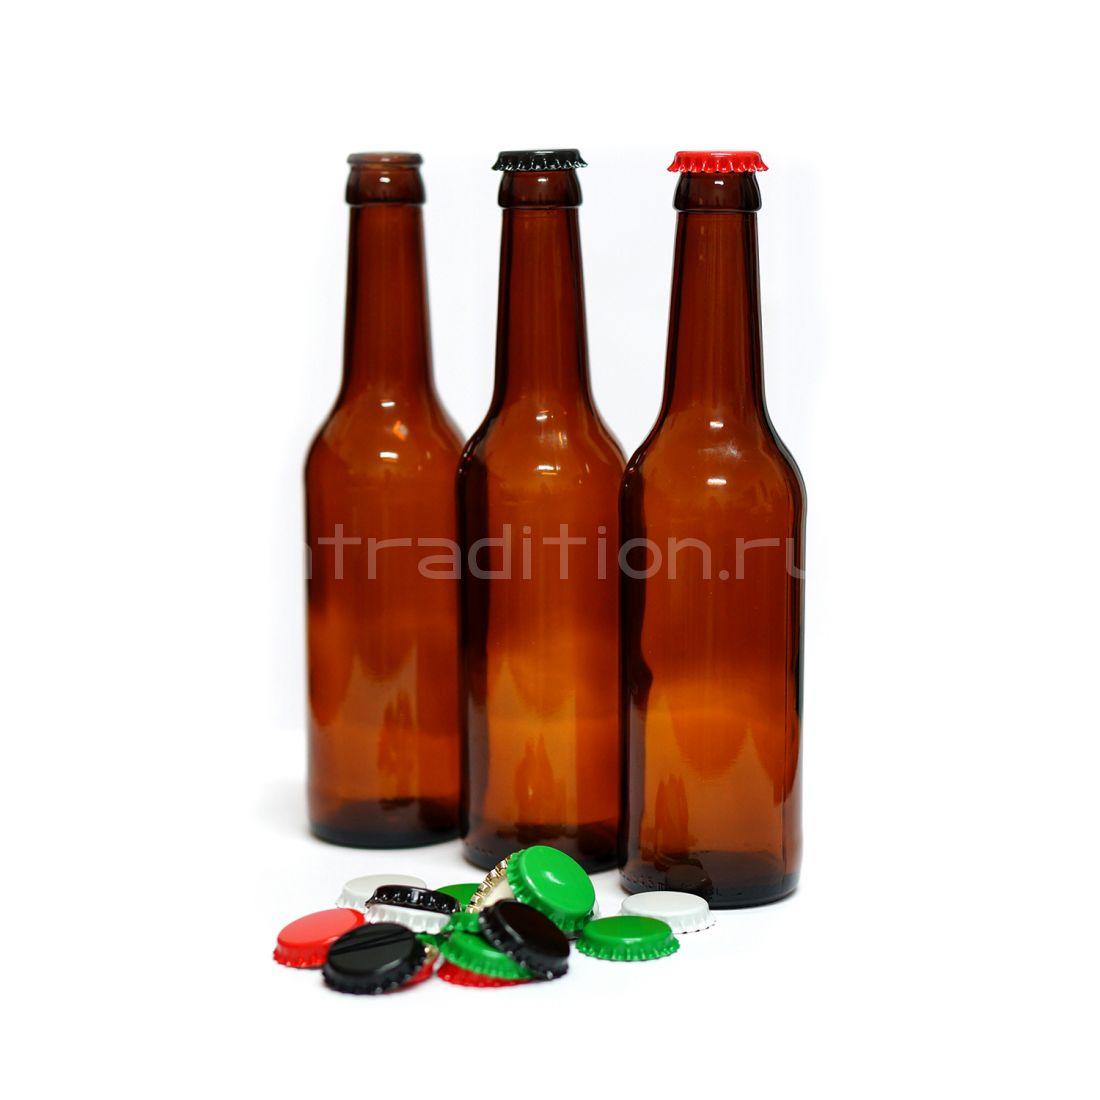 Бутылка под кронен пробку Лаундж (Lounge) 0,33 / 20 шт.